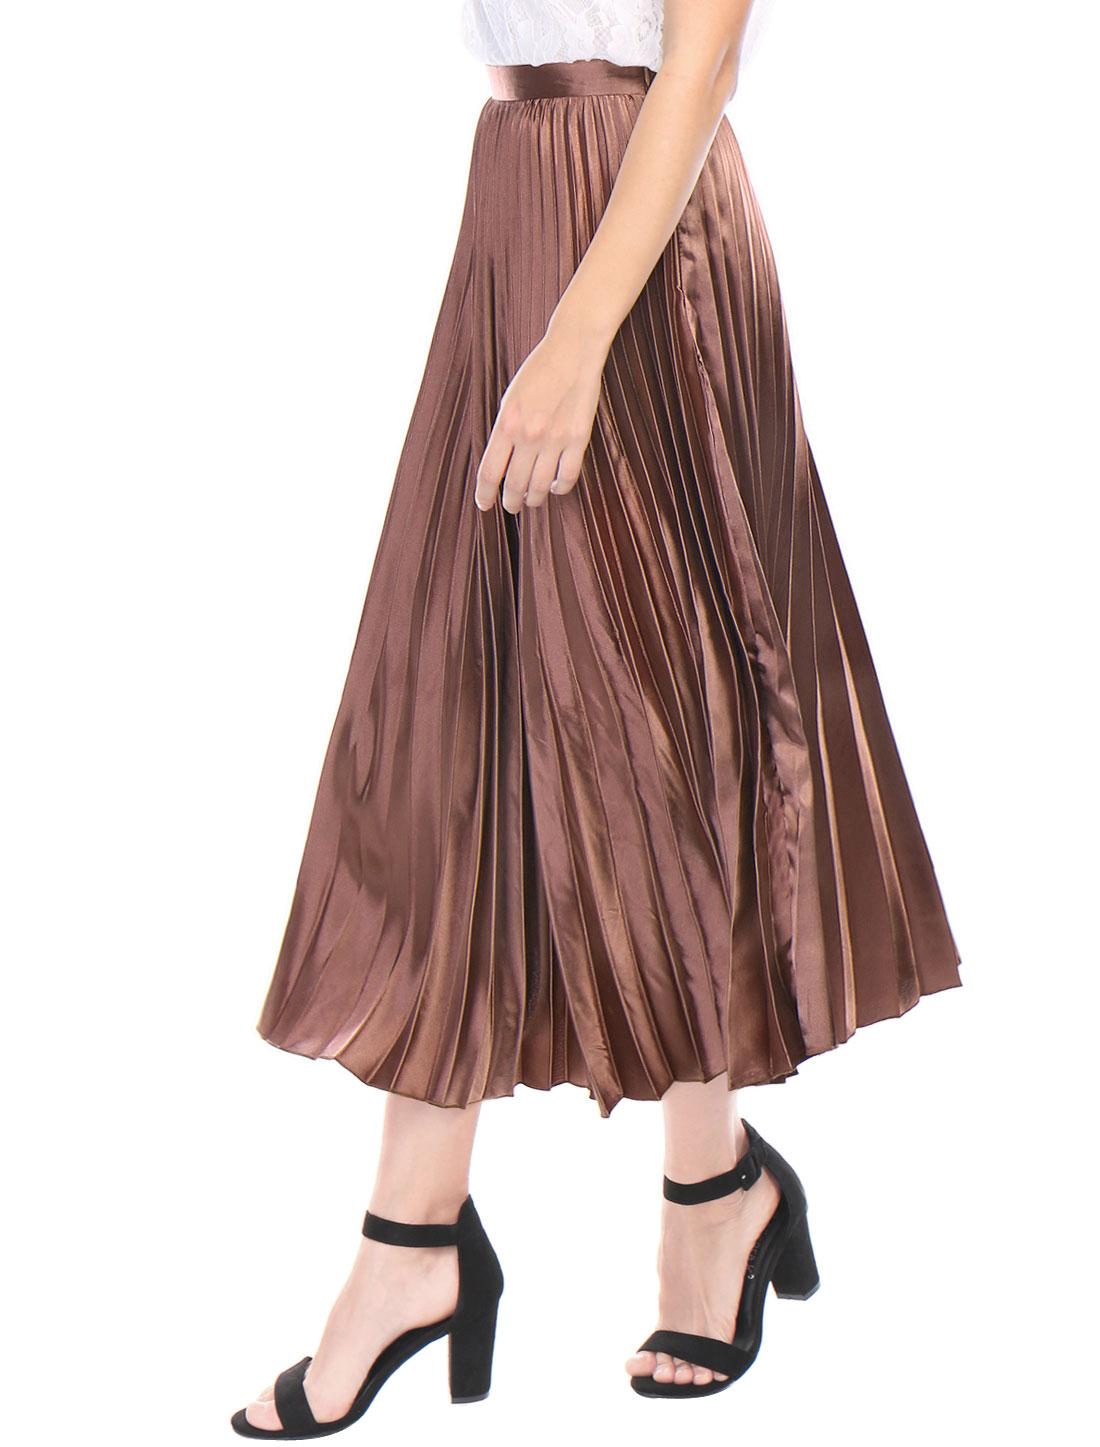 44937841b7 Unique Bargains Women's Accordion Pleats High Waist Metallic Midi Skirt  Copper (Size S / 6